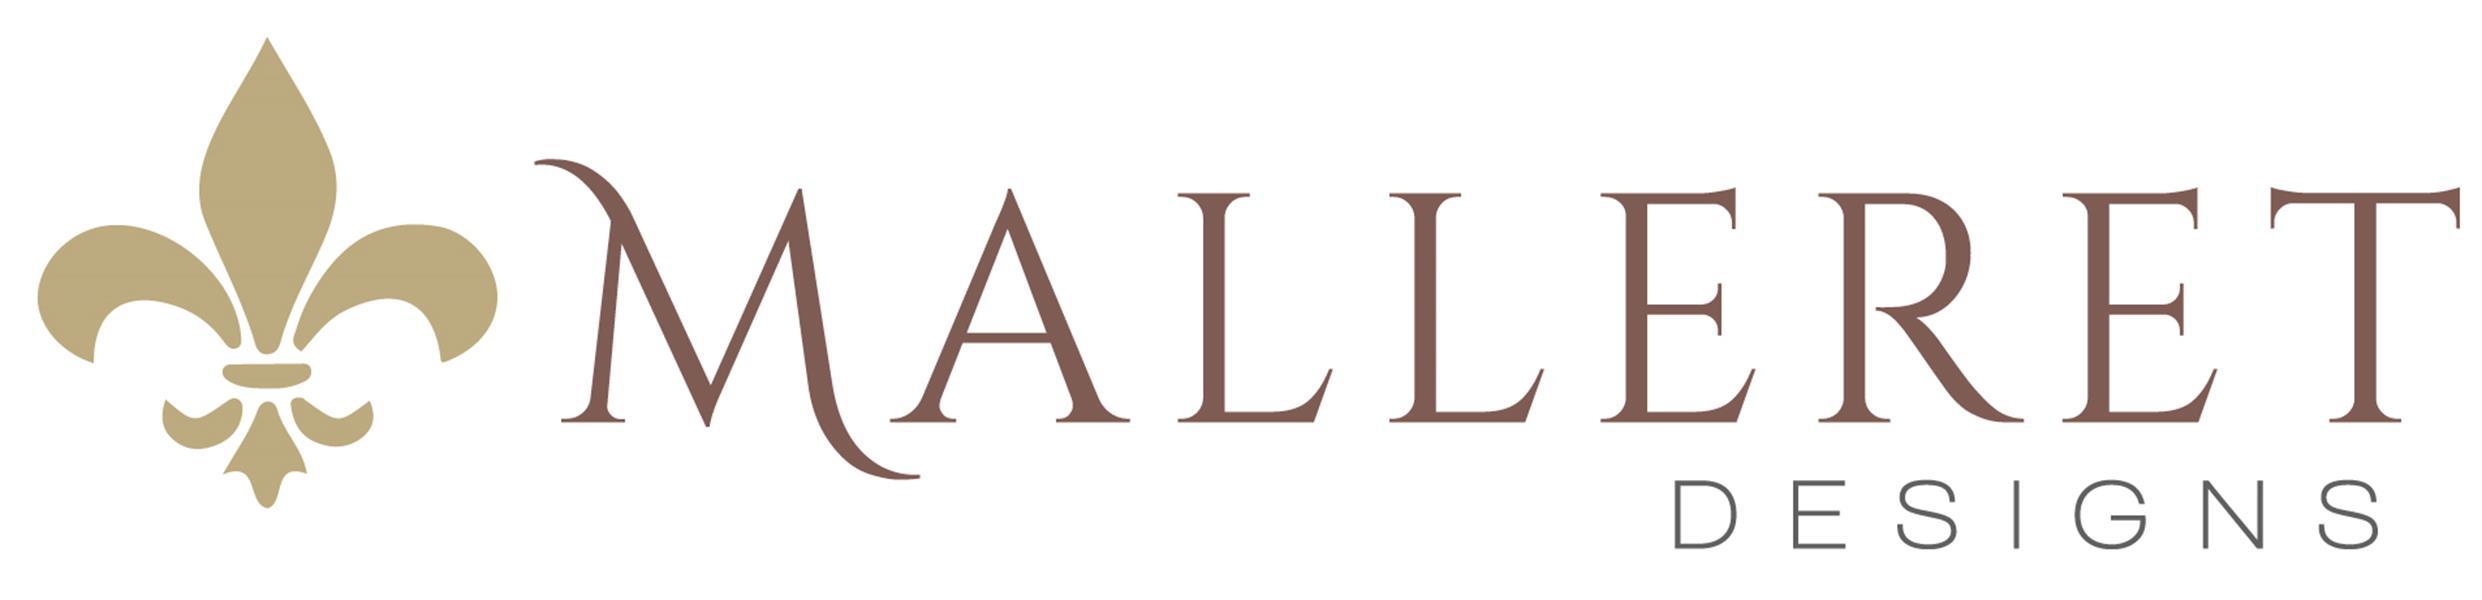 Malleret Designs